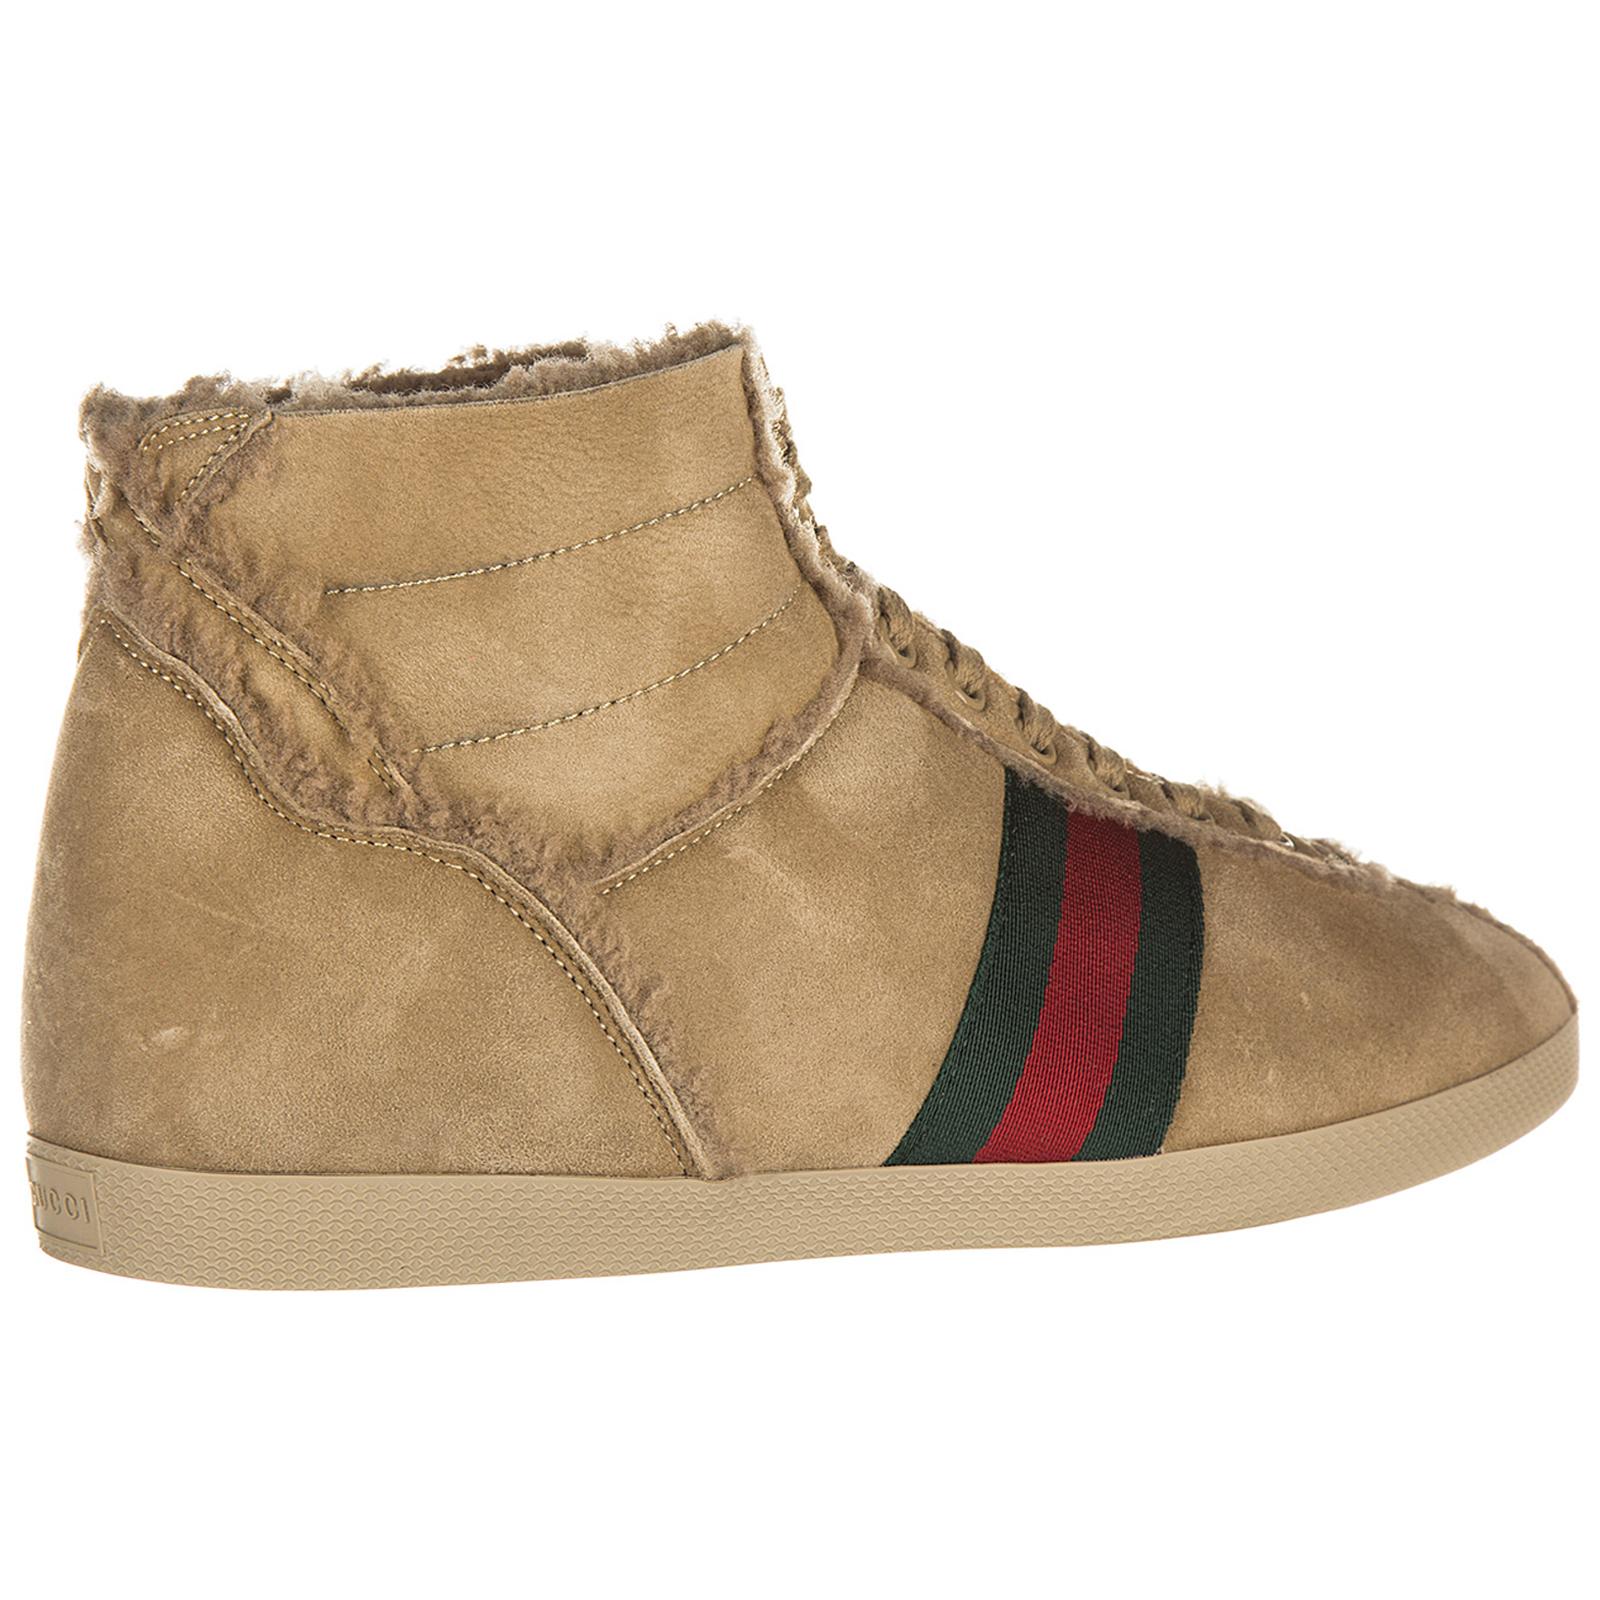 Chaussures baskets sneakers hautes homme en daim shearling